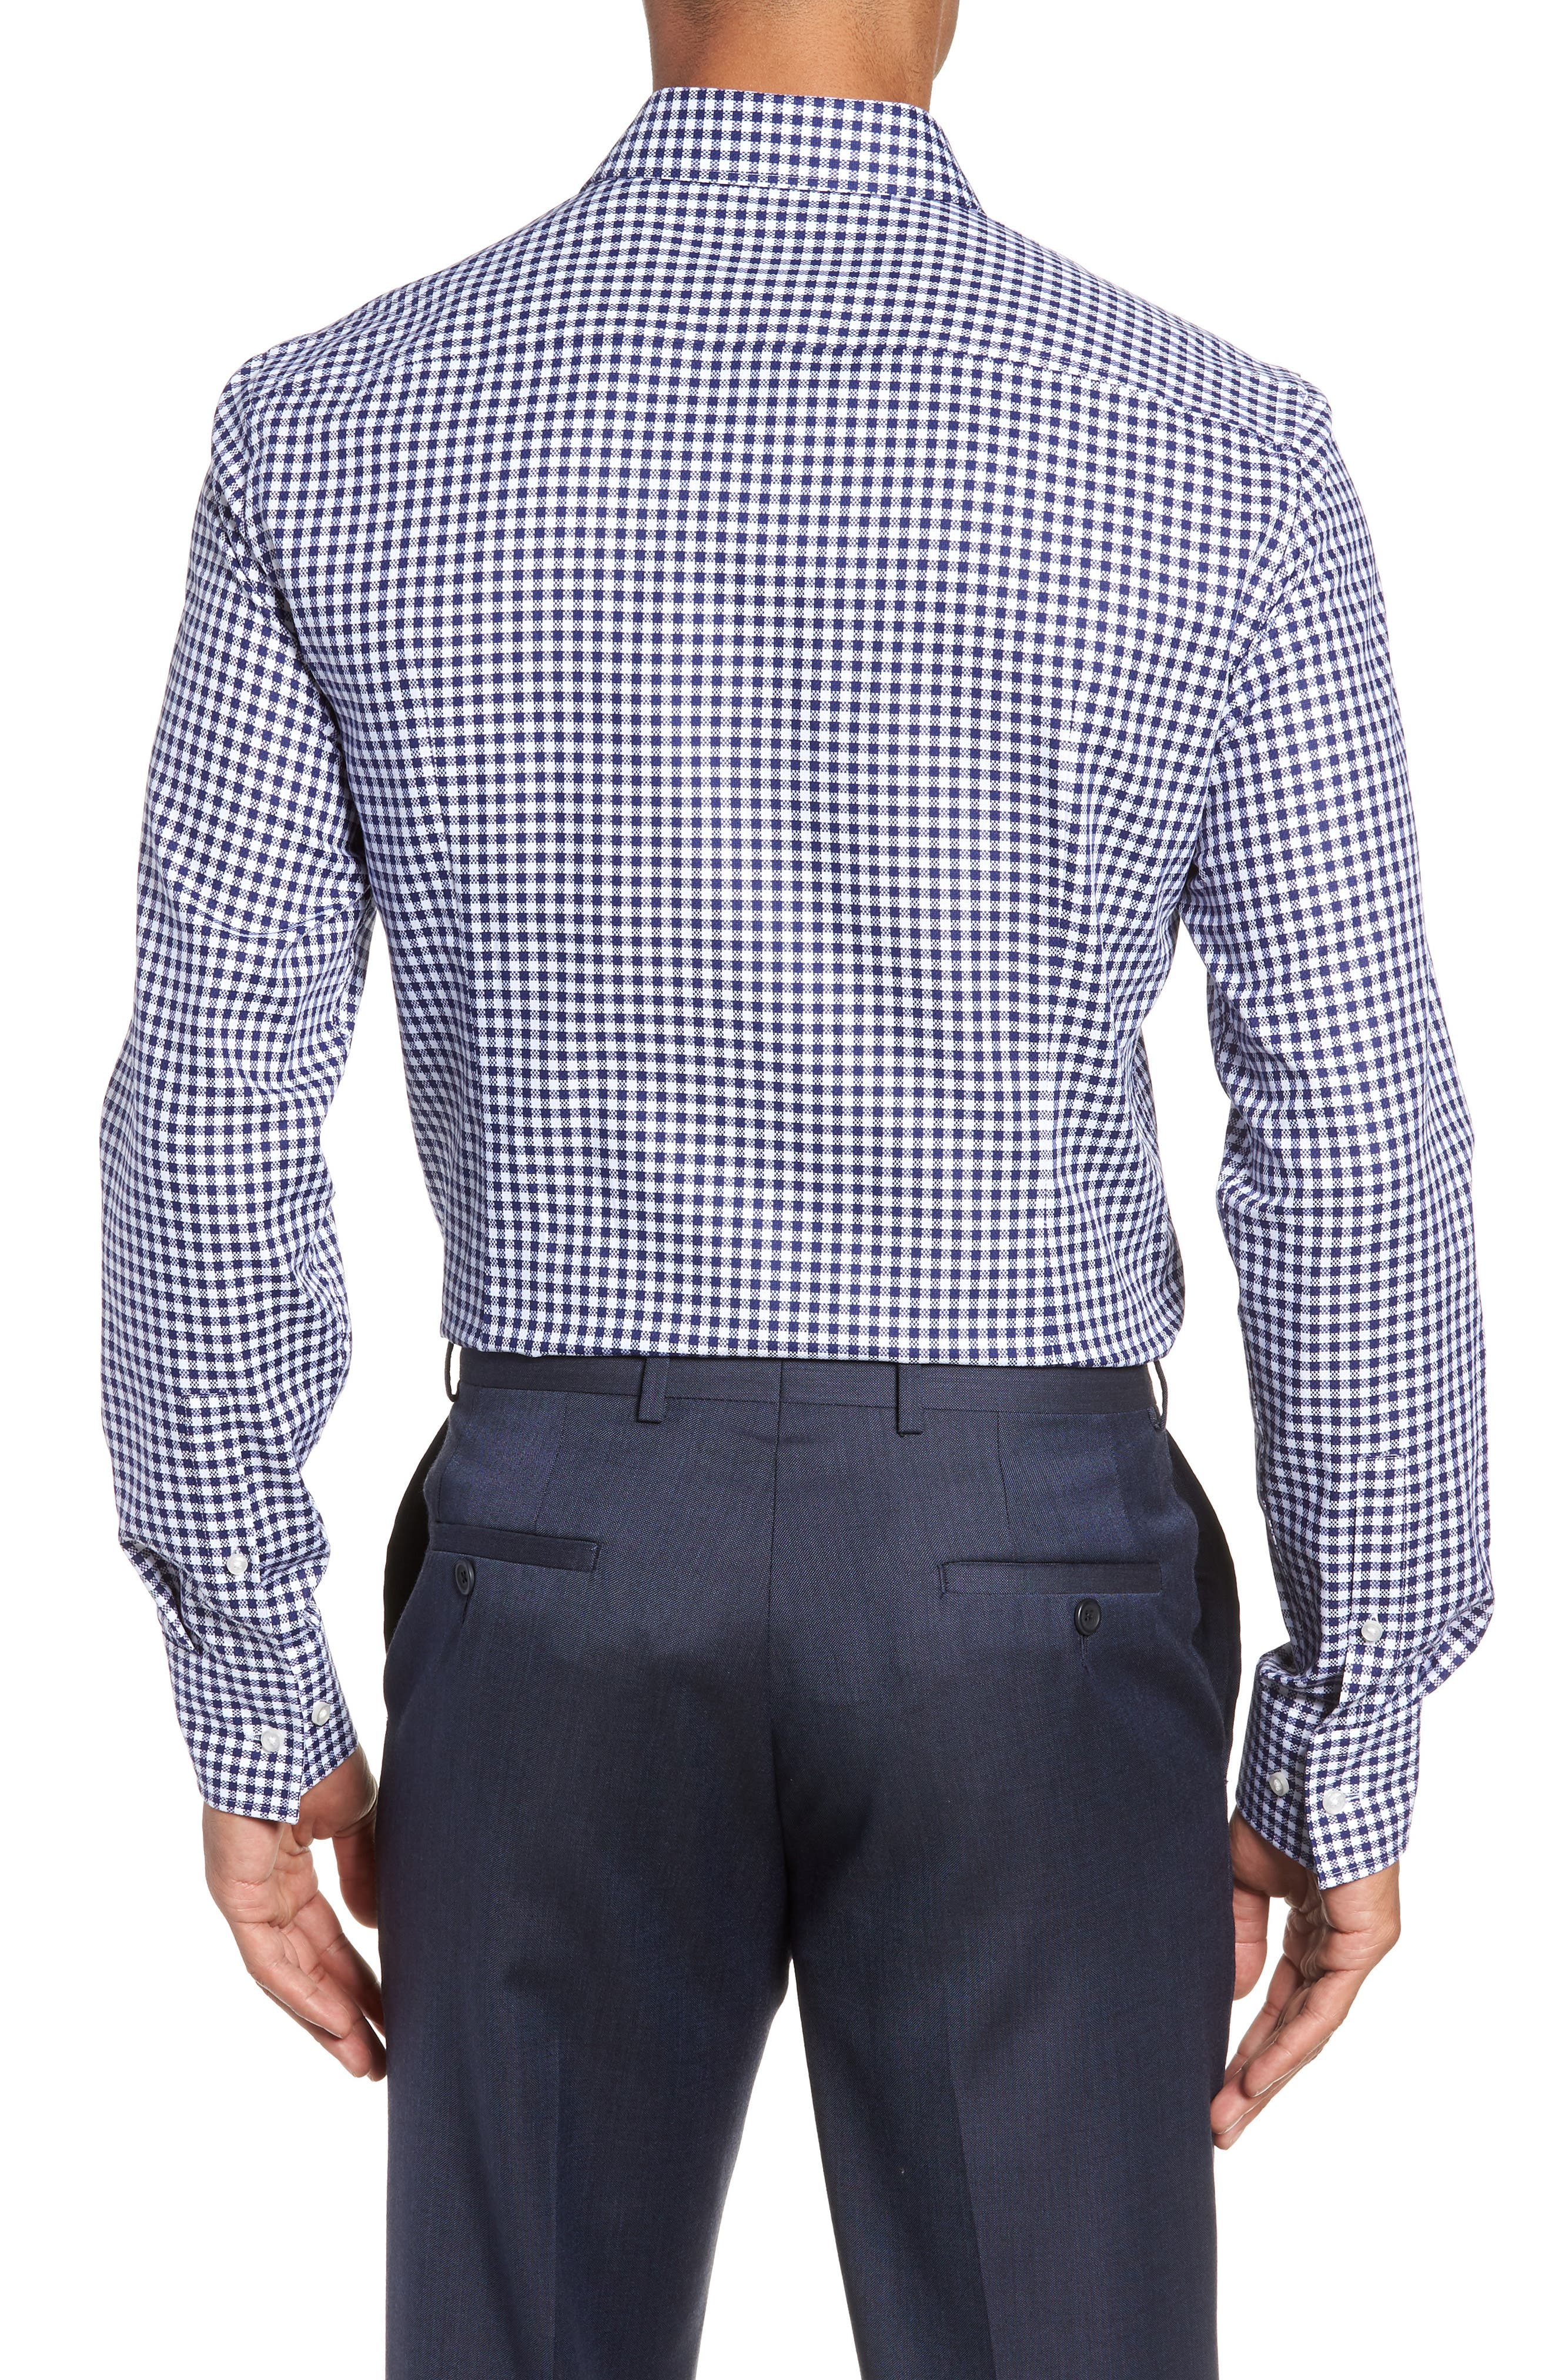 Jason Slim Fit Check Dress Shirt,                             Alternate thumbnail 3, color,                             NAVY